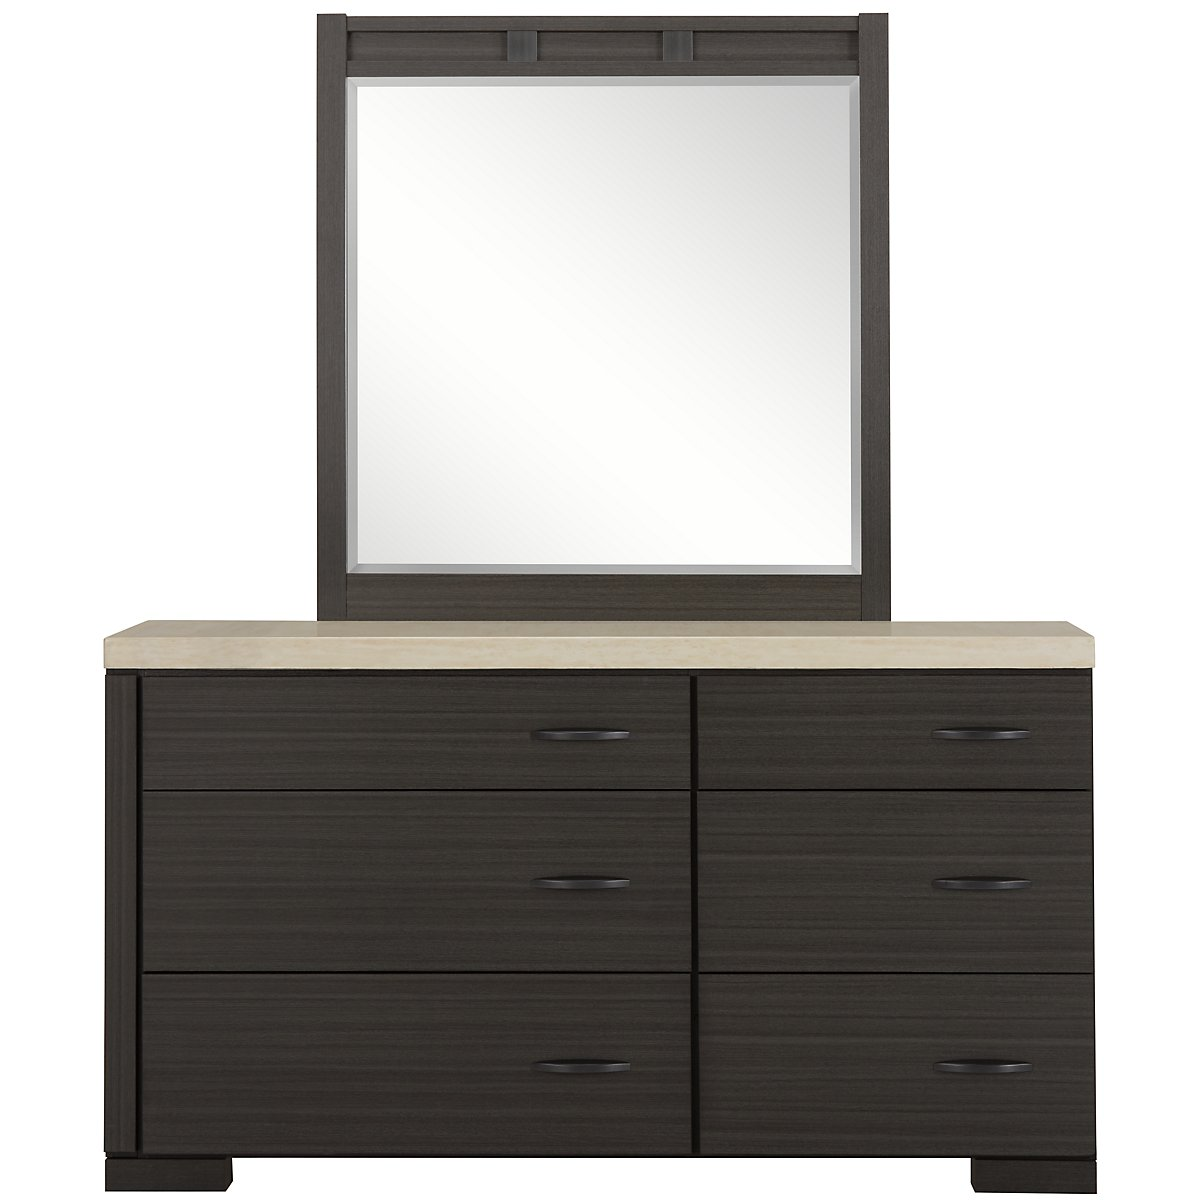 Bedroom Furniture Dresser City Furniture Bedroom Furniture Dressers Mirrors Chests